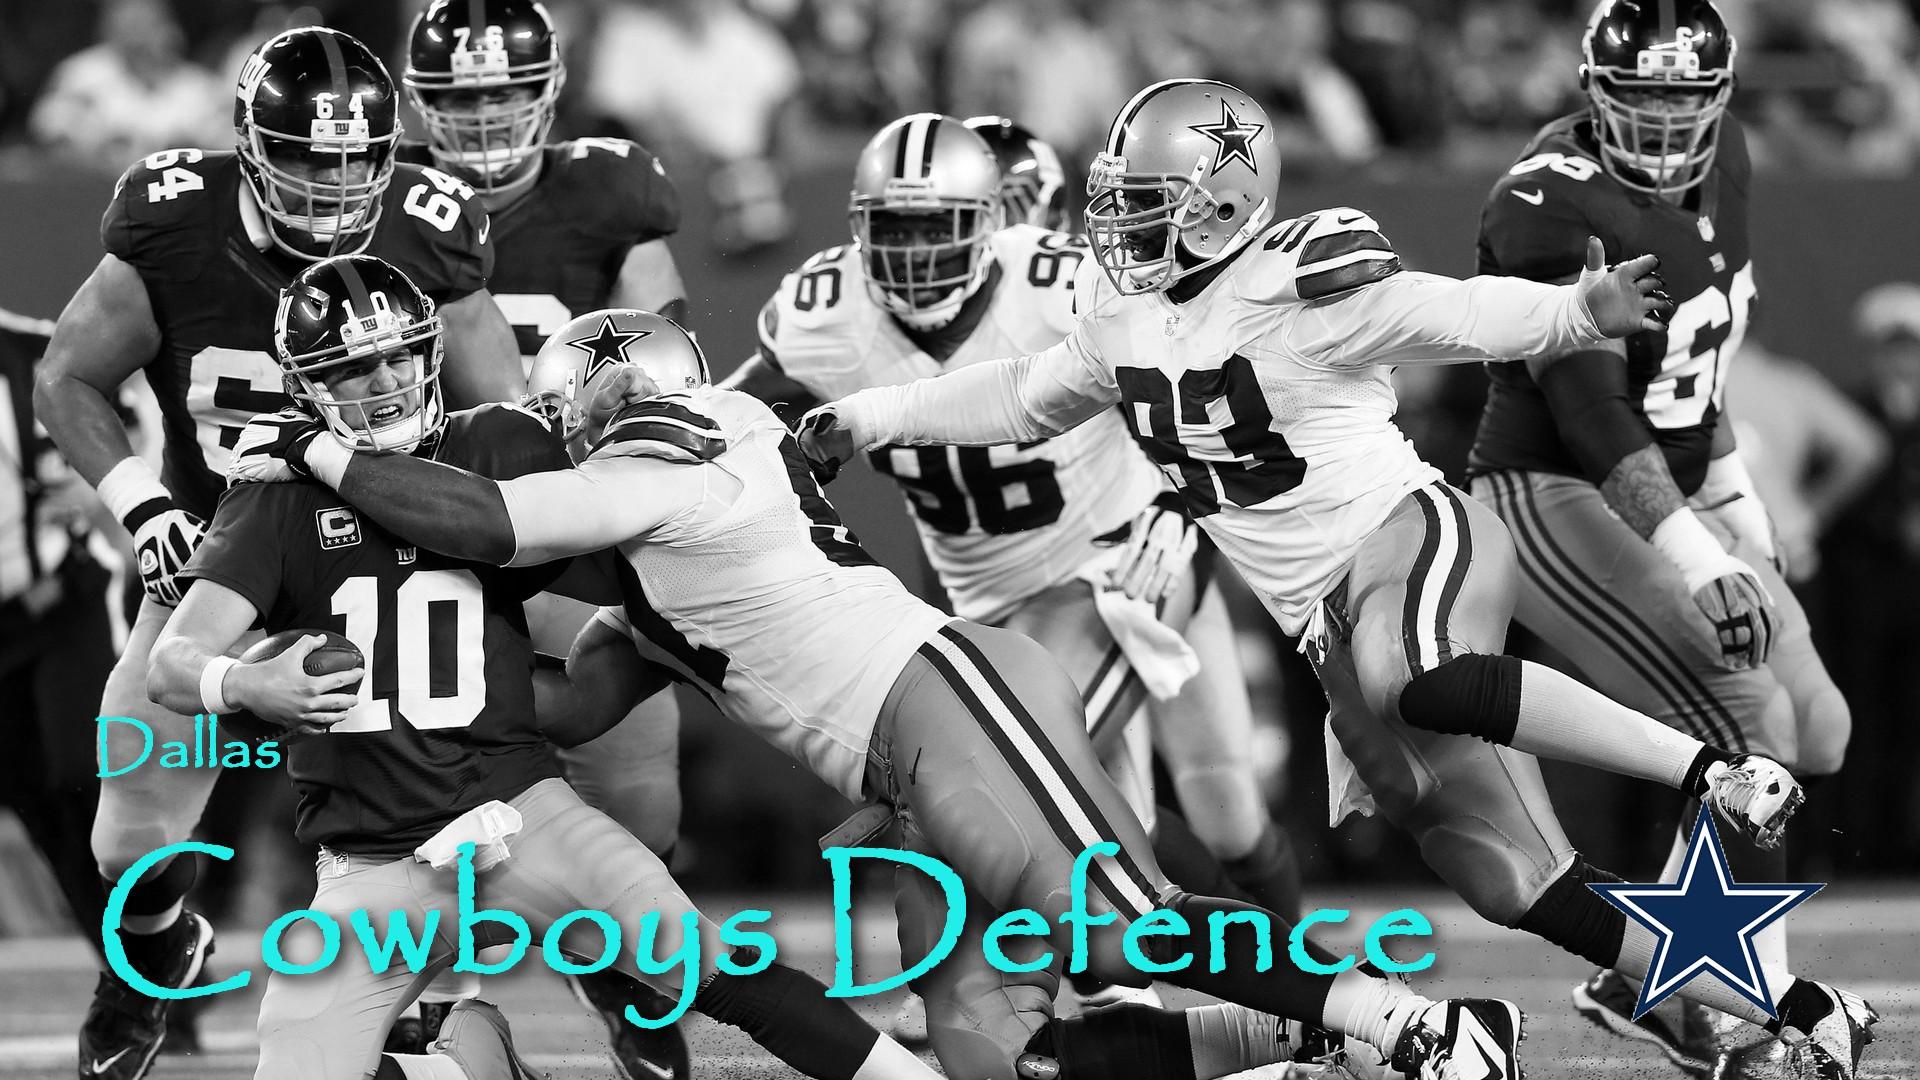 Cowboys-Vs-Giants-wallpaper-wp3804126